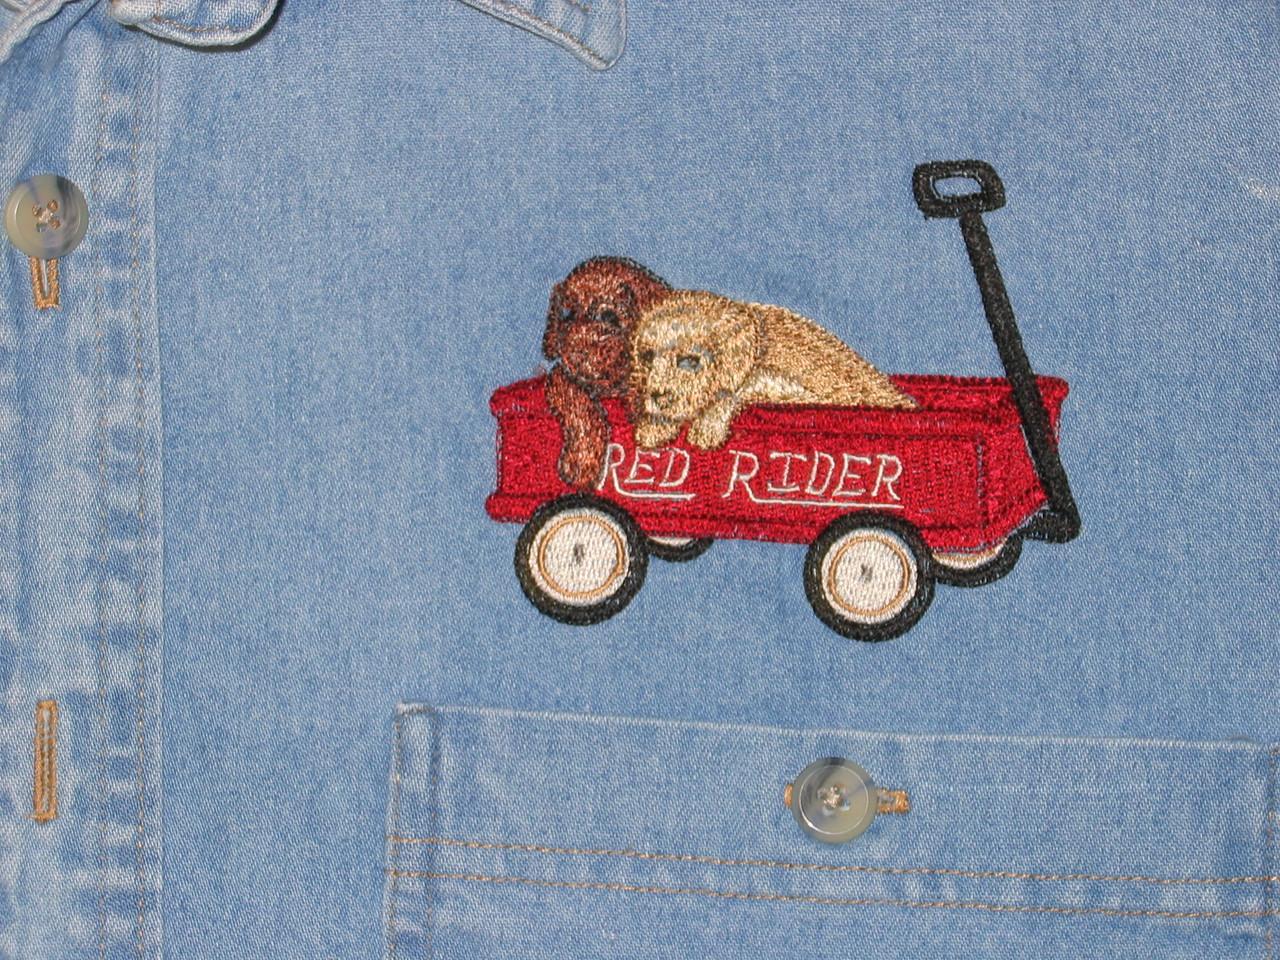 Dogs in wagon dec 03